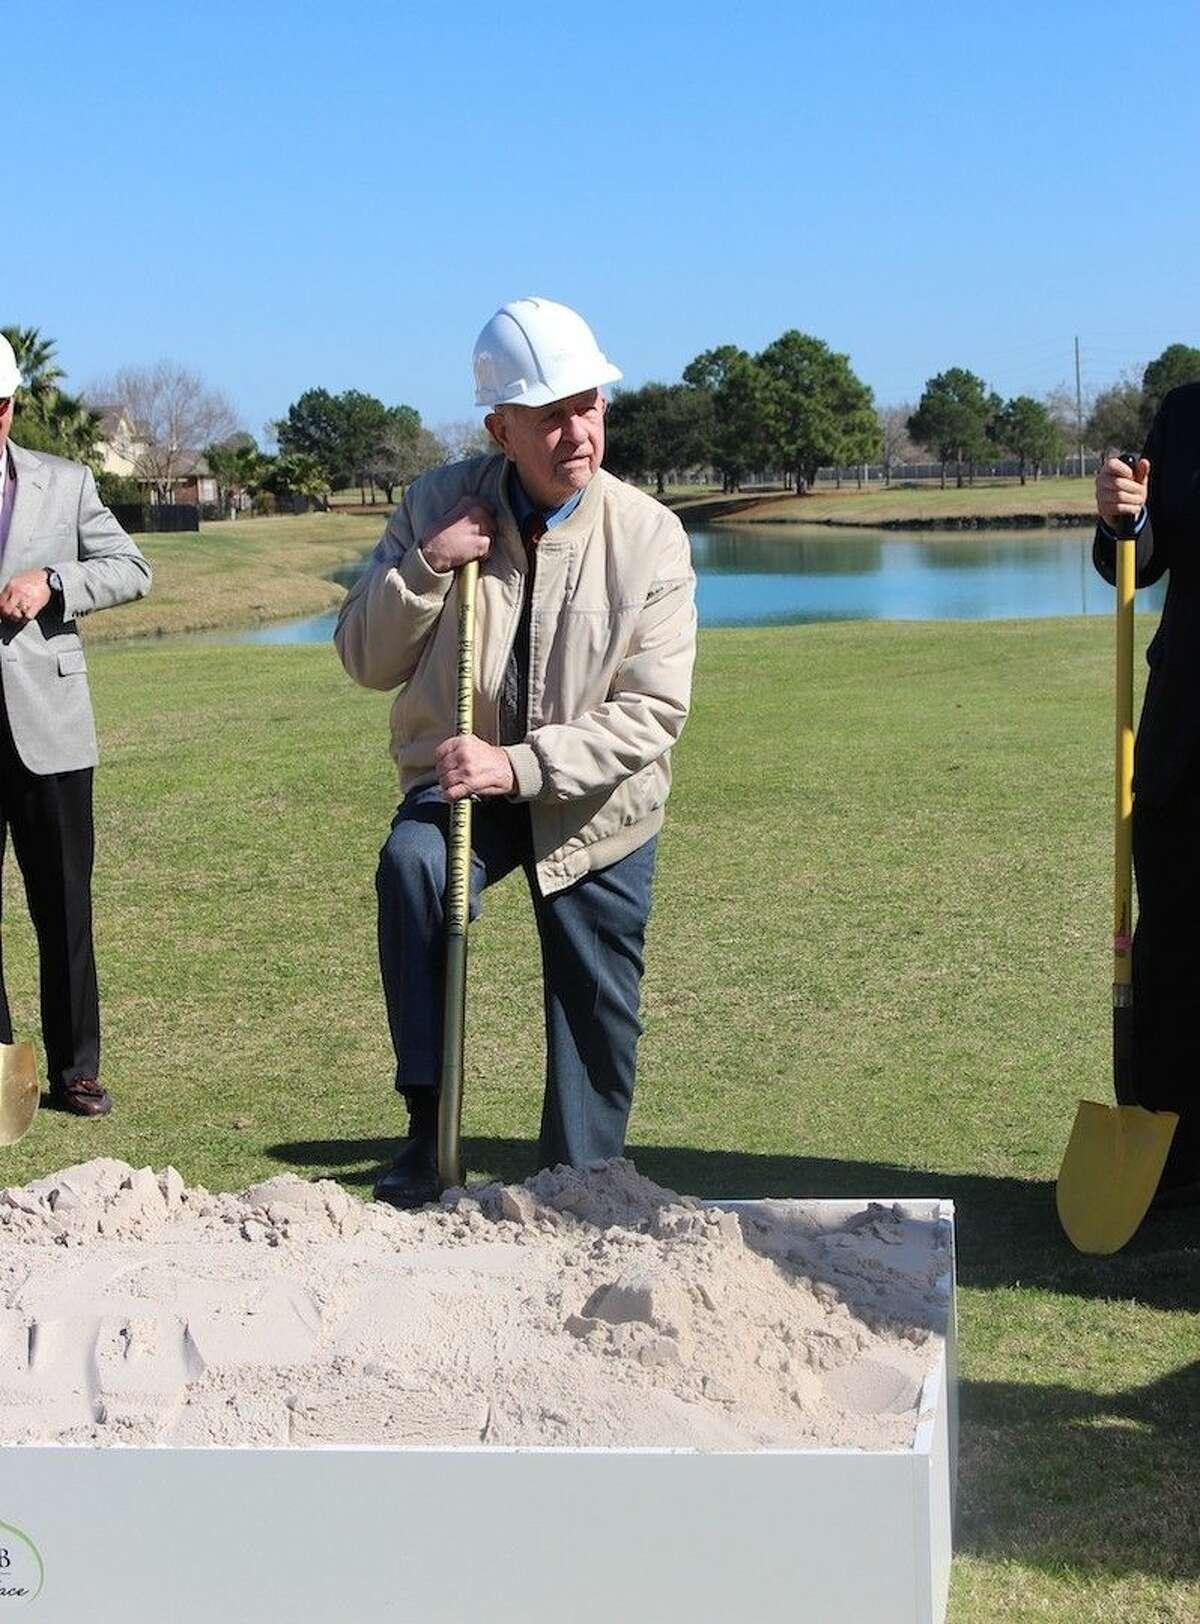 Mayor Reid strikes a pose on the 10th hole.